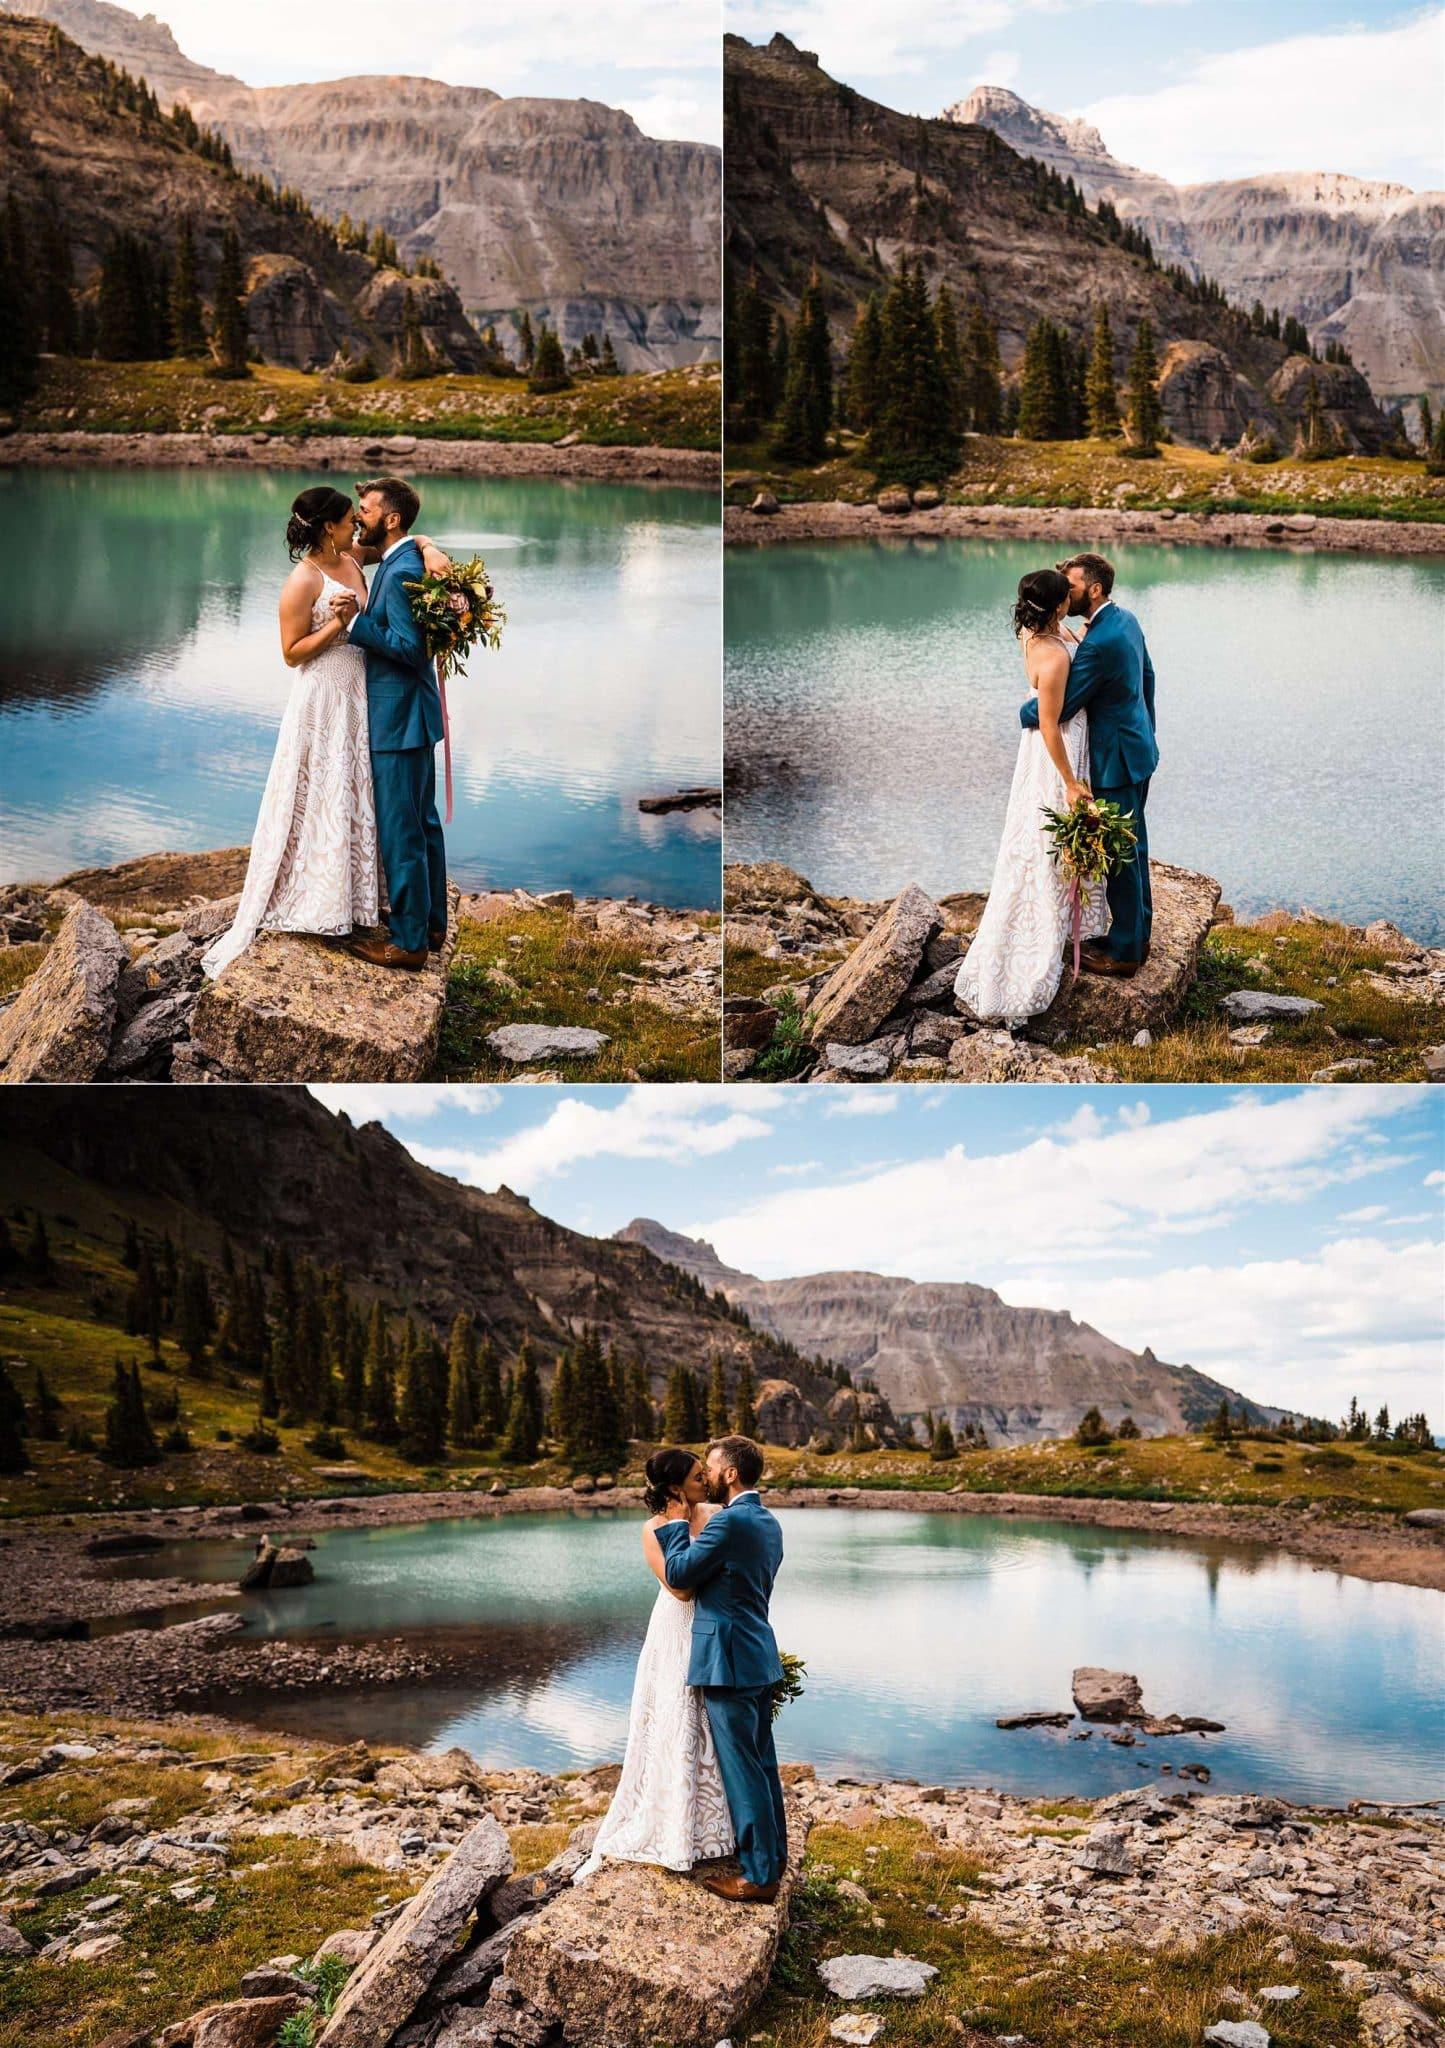 Colorado_Jeeping_Elopement_Emily_Matt_The_Foxes_Photography_0018.jpg